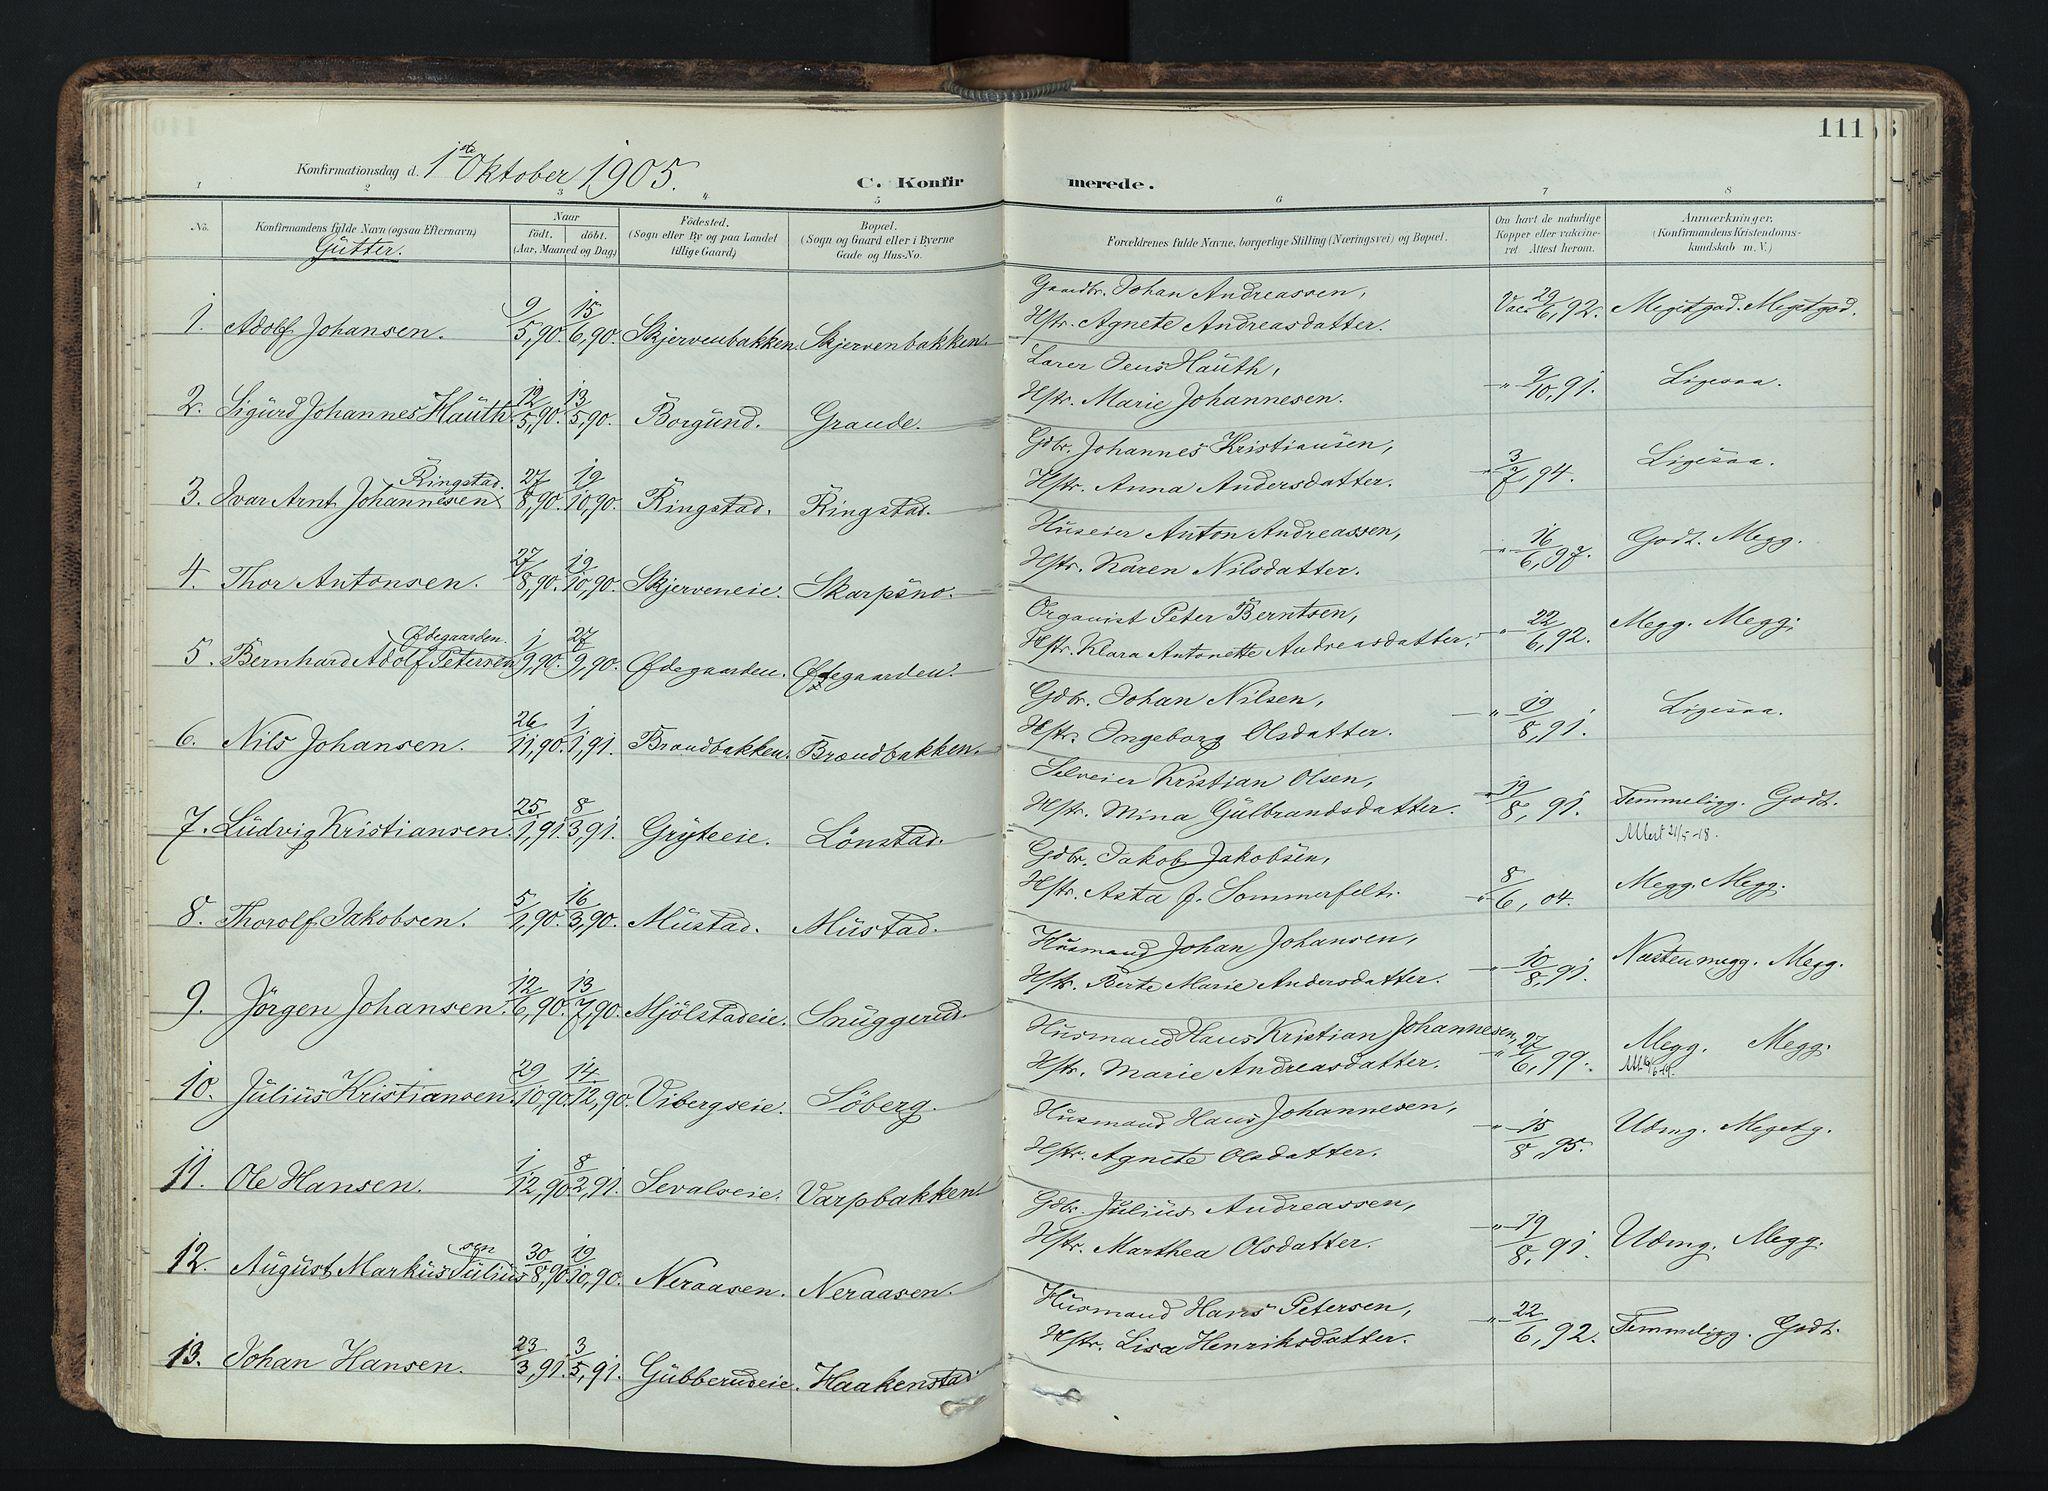 SAH, Vardal prestekontor, H/Ha/Haa/L0019: Ministerialbok nr. 19, 1893-1907, s. 111